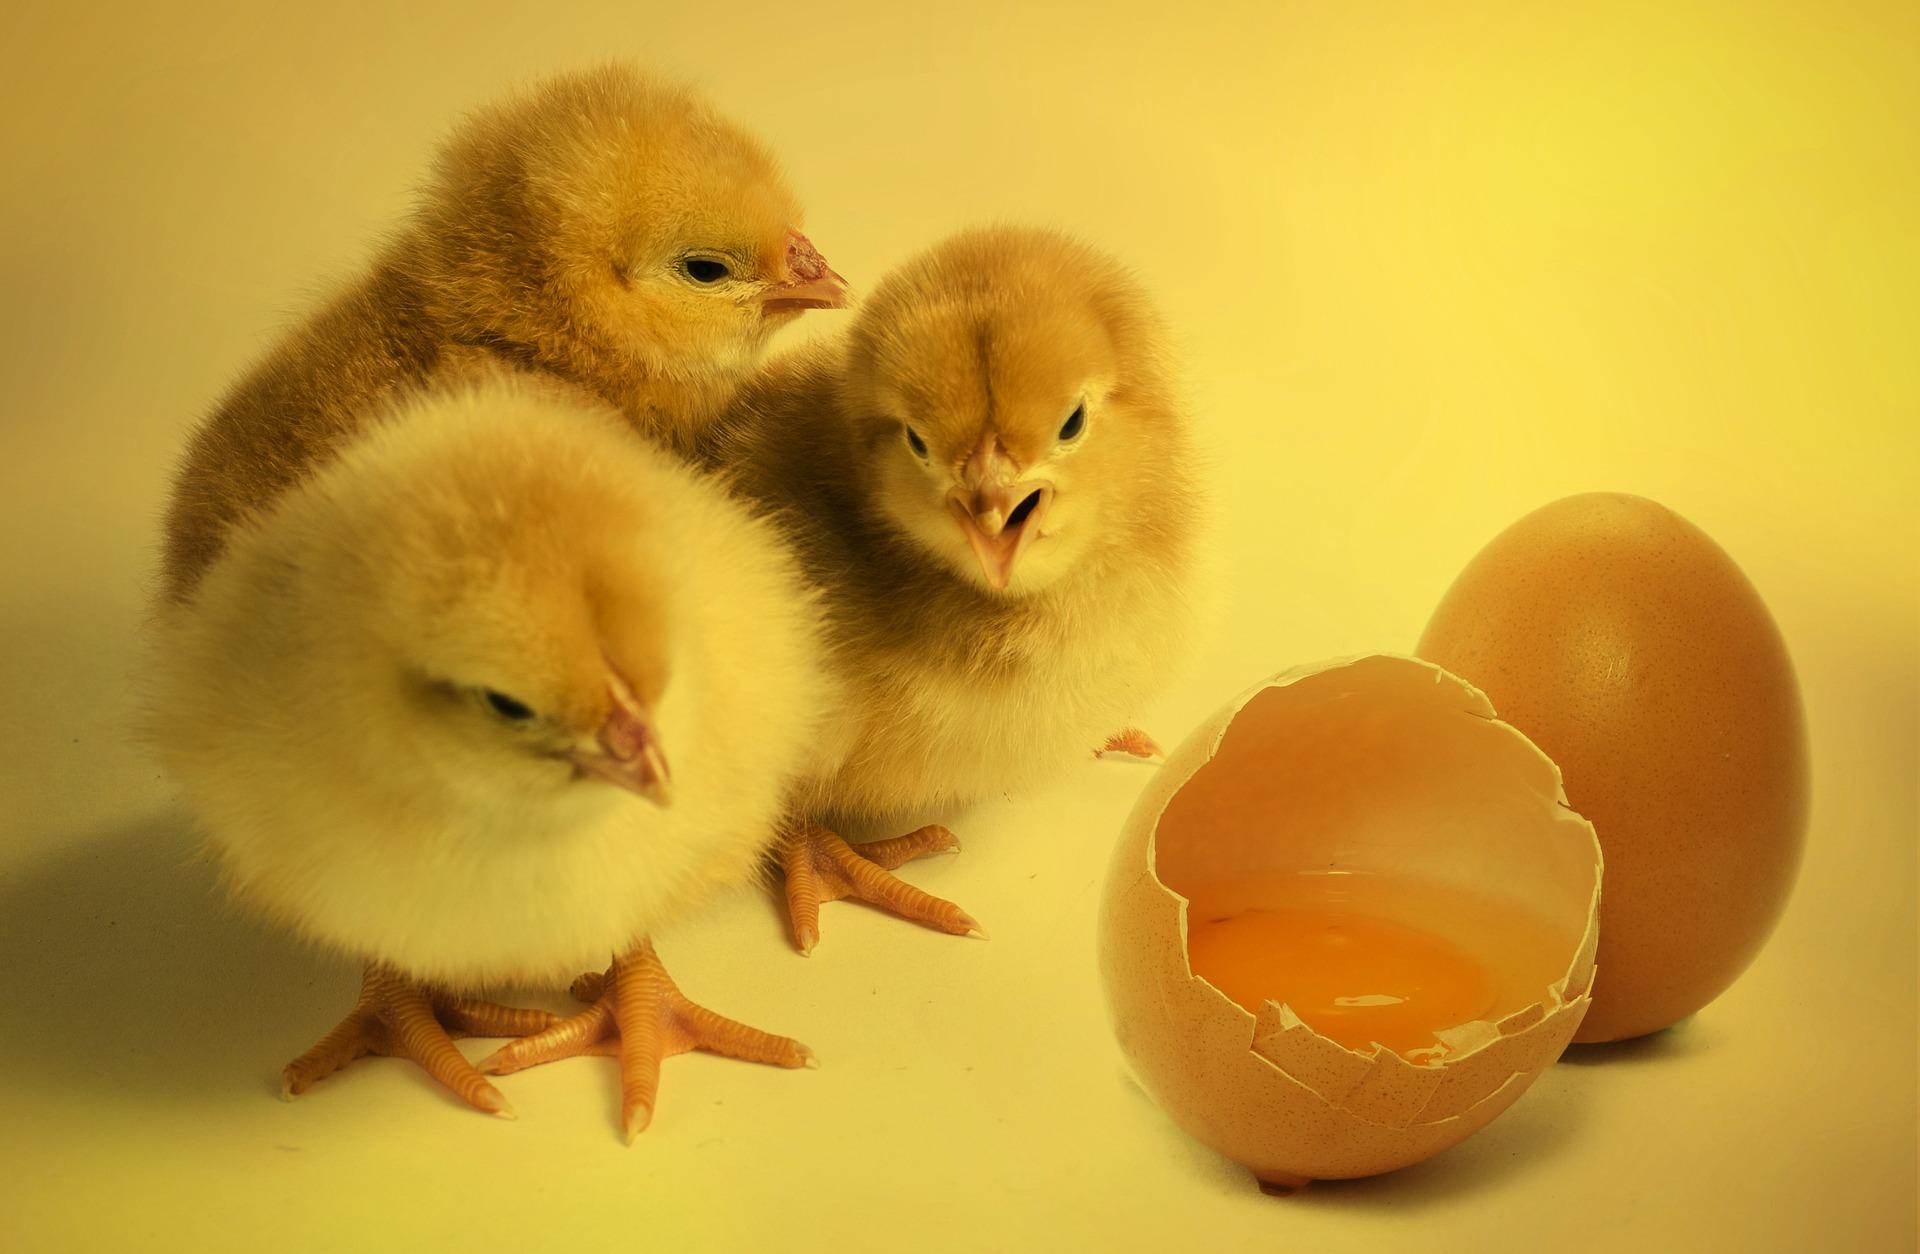 chicks-2965846_1920.jpg